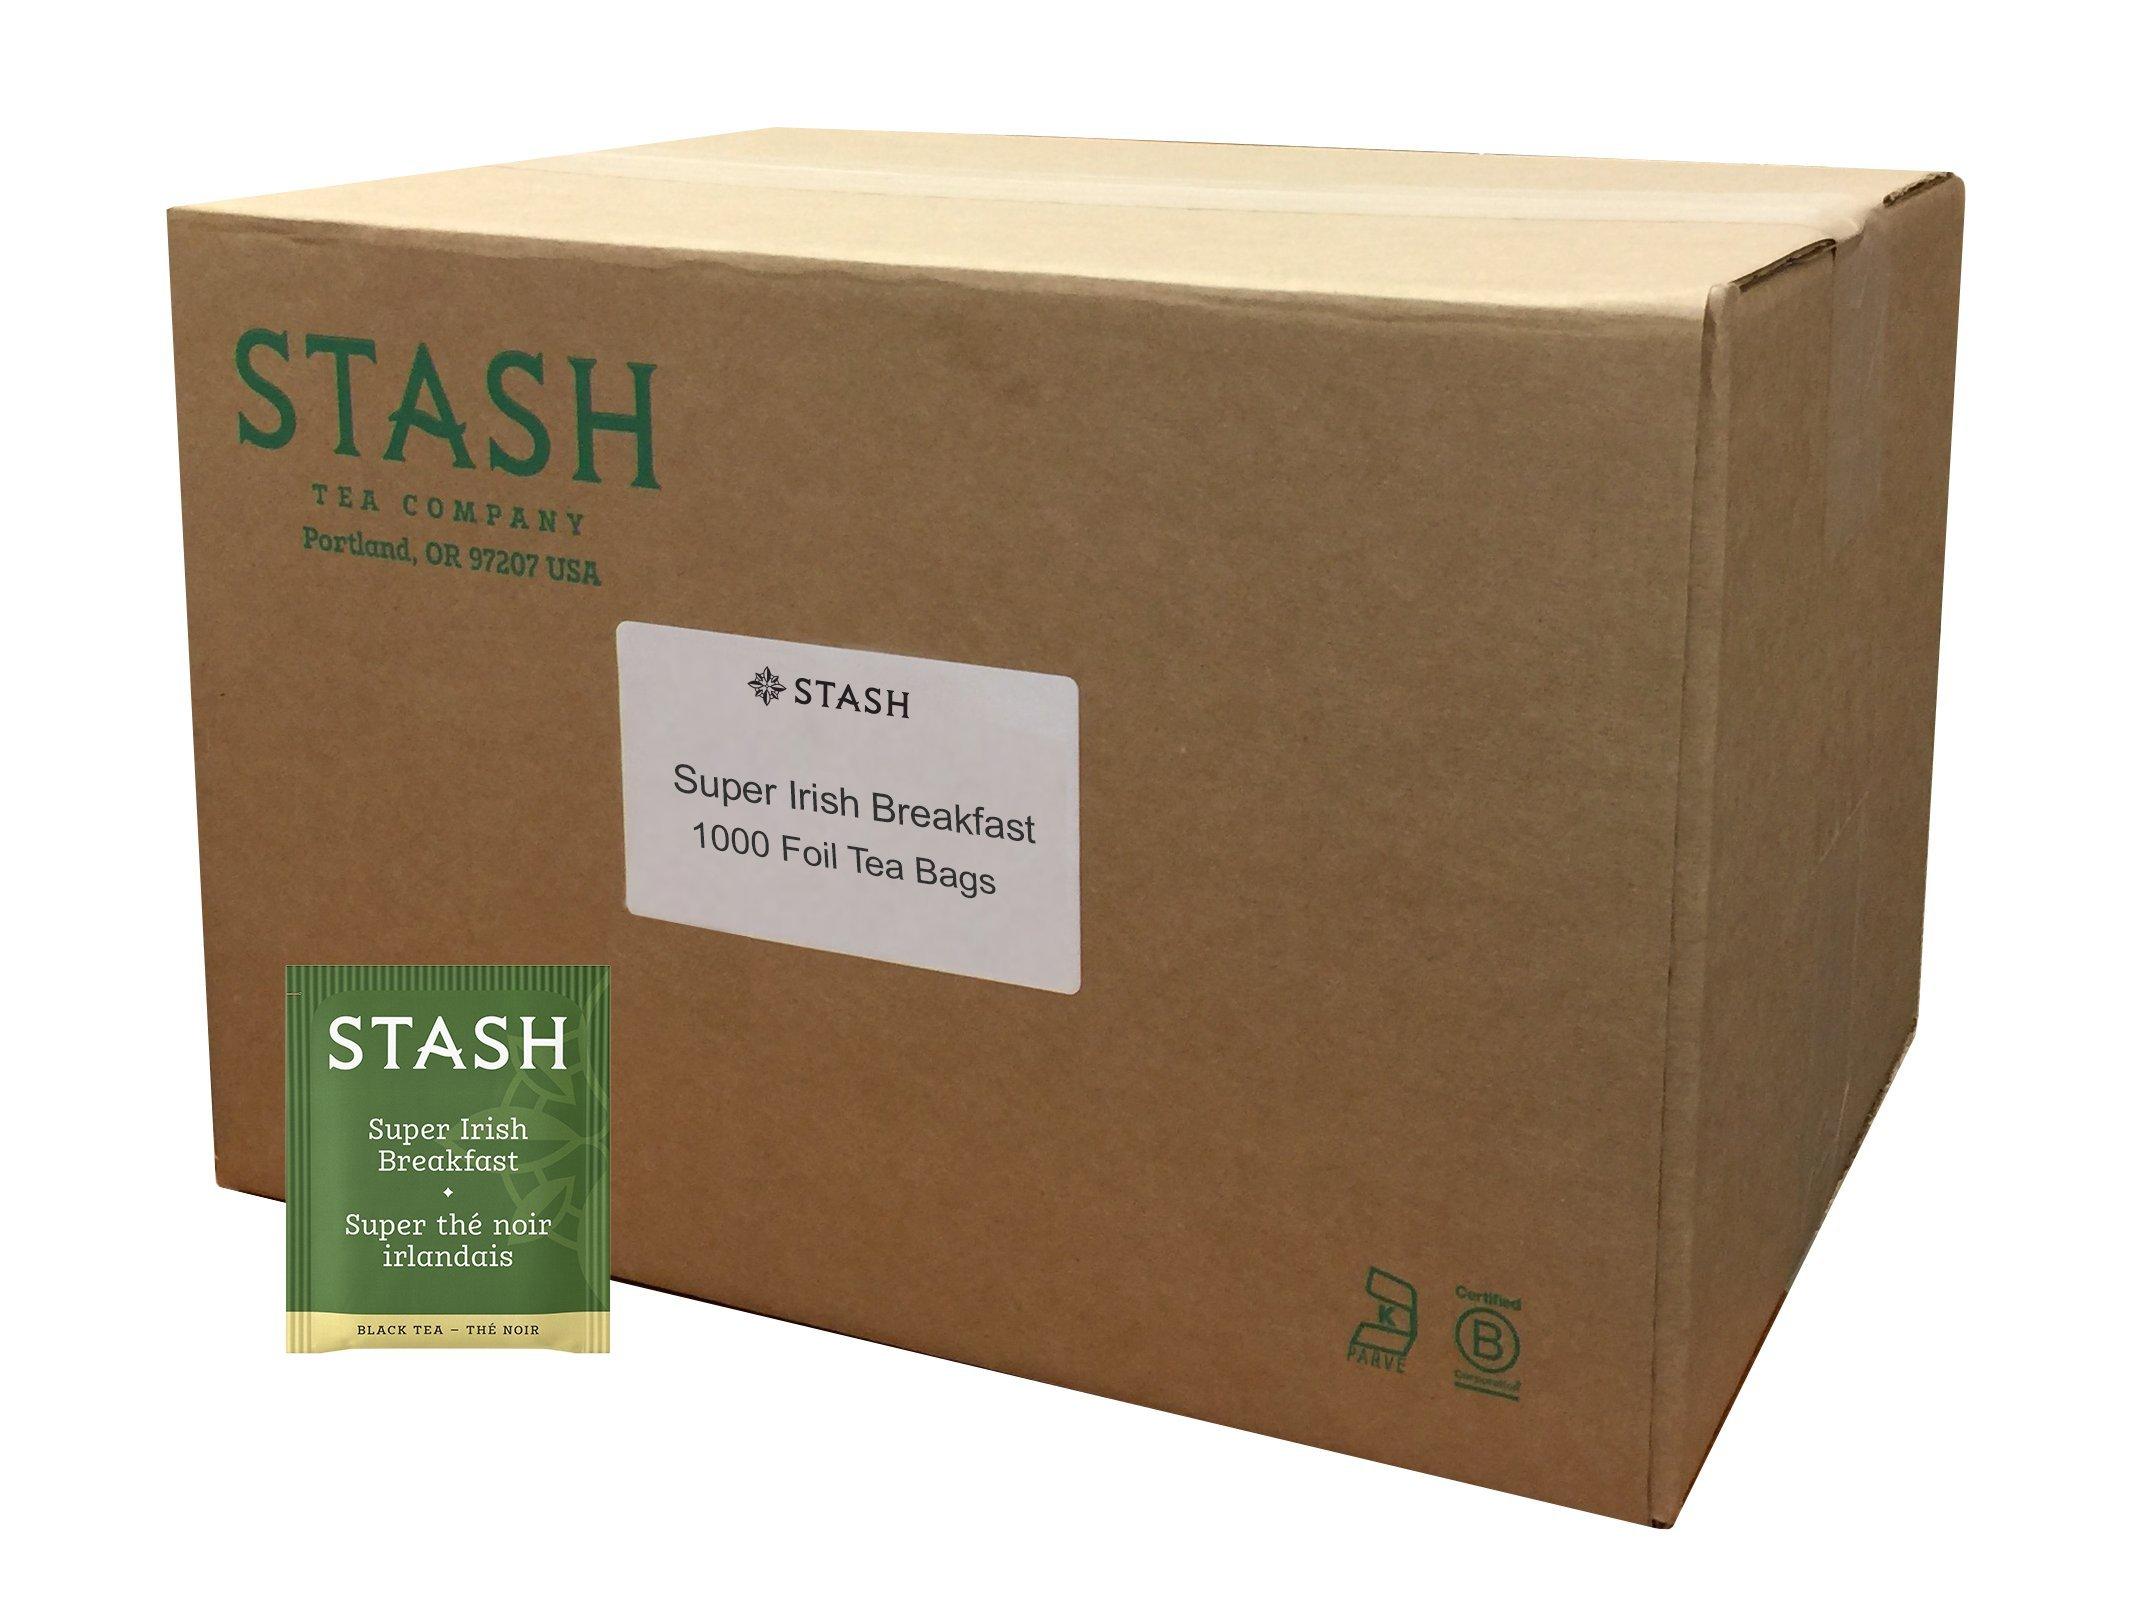 Stash Tea Super Irish Breakfast Black Tea 1000 Tea Bags in 8.8 Pound Box Individual Black Tea Bags for Use in Teapots Mugs or Cups, Brew Hot Tea or Iced Tea